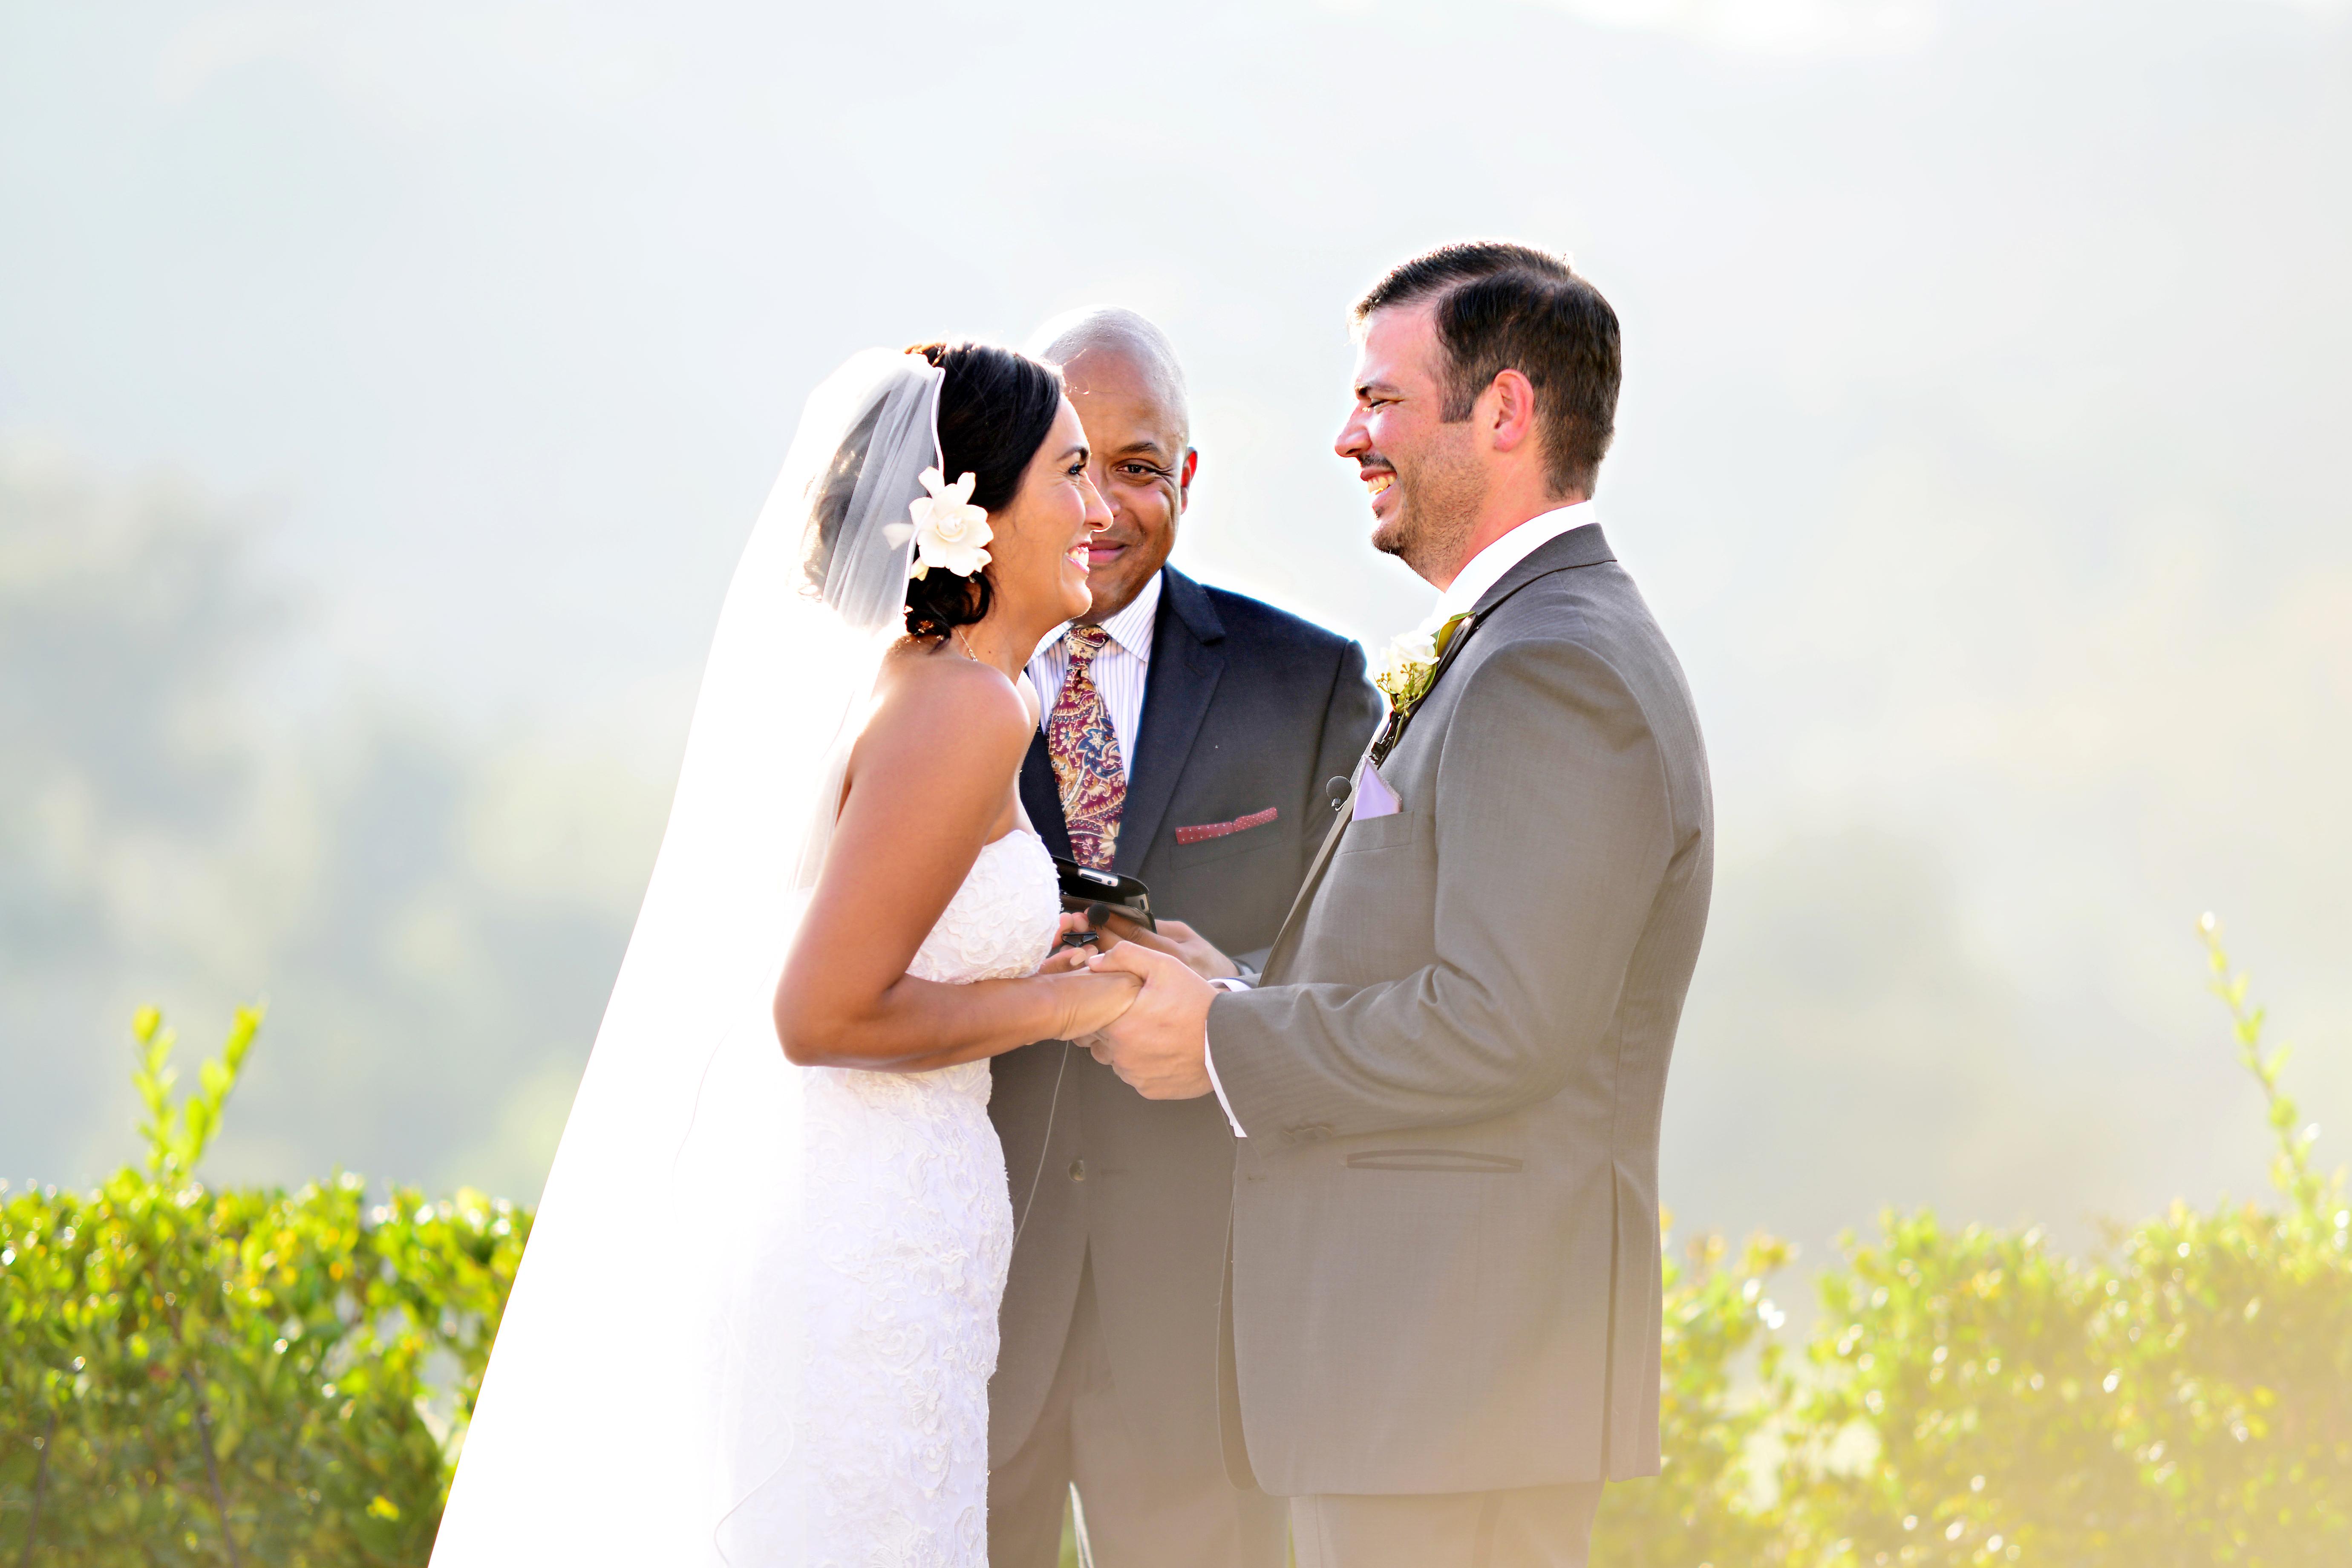 san diego ceremony, steph wong weddings, southern california wedding ceremony, beach ceremony, maderas golf course